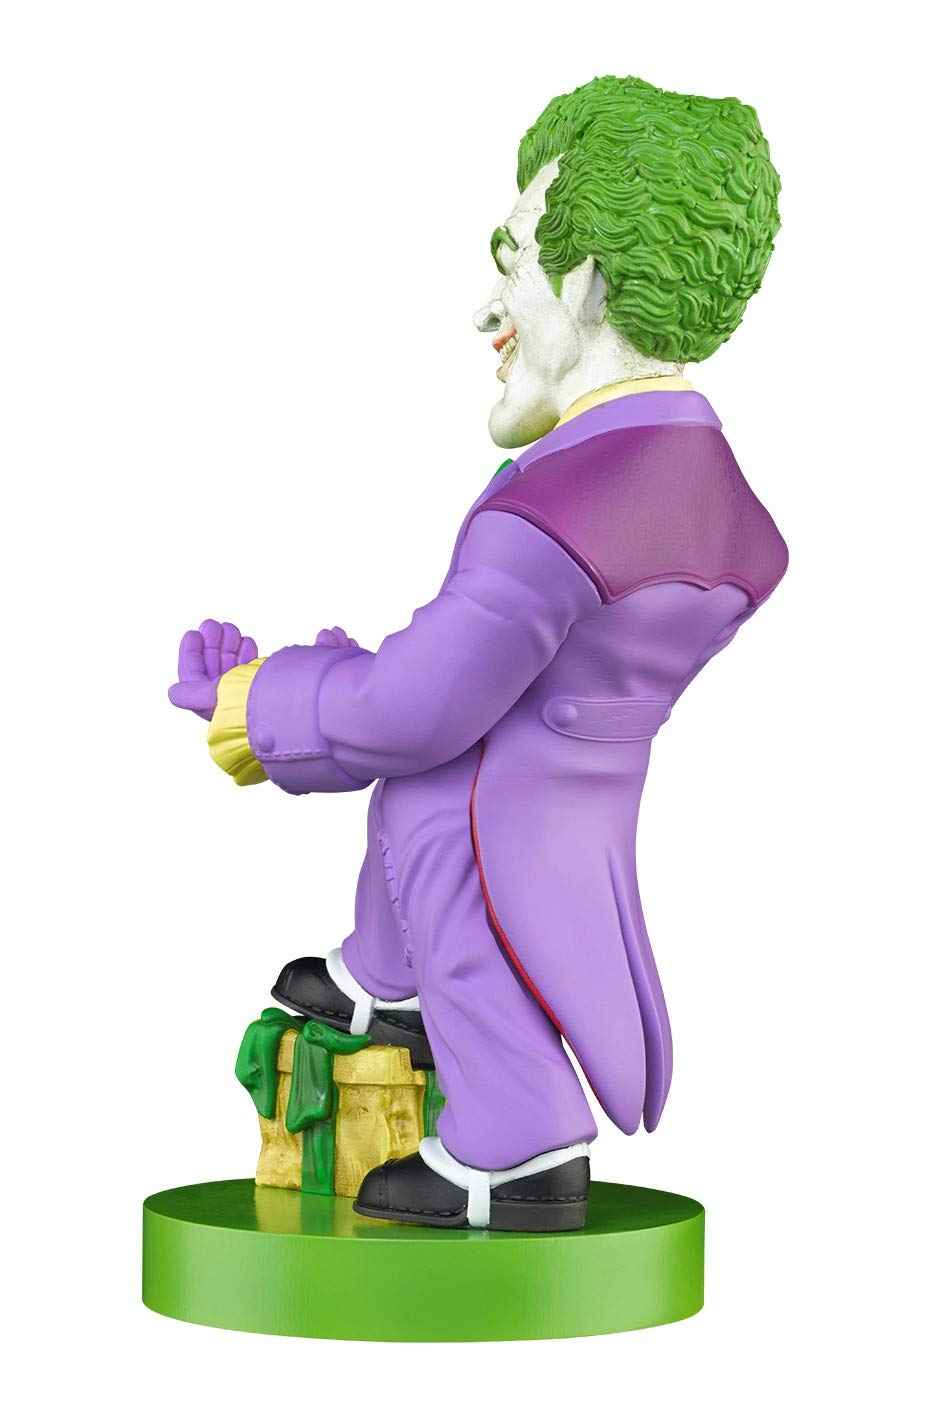 Joker Cable Guys